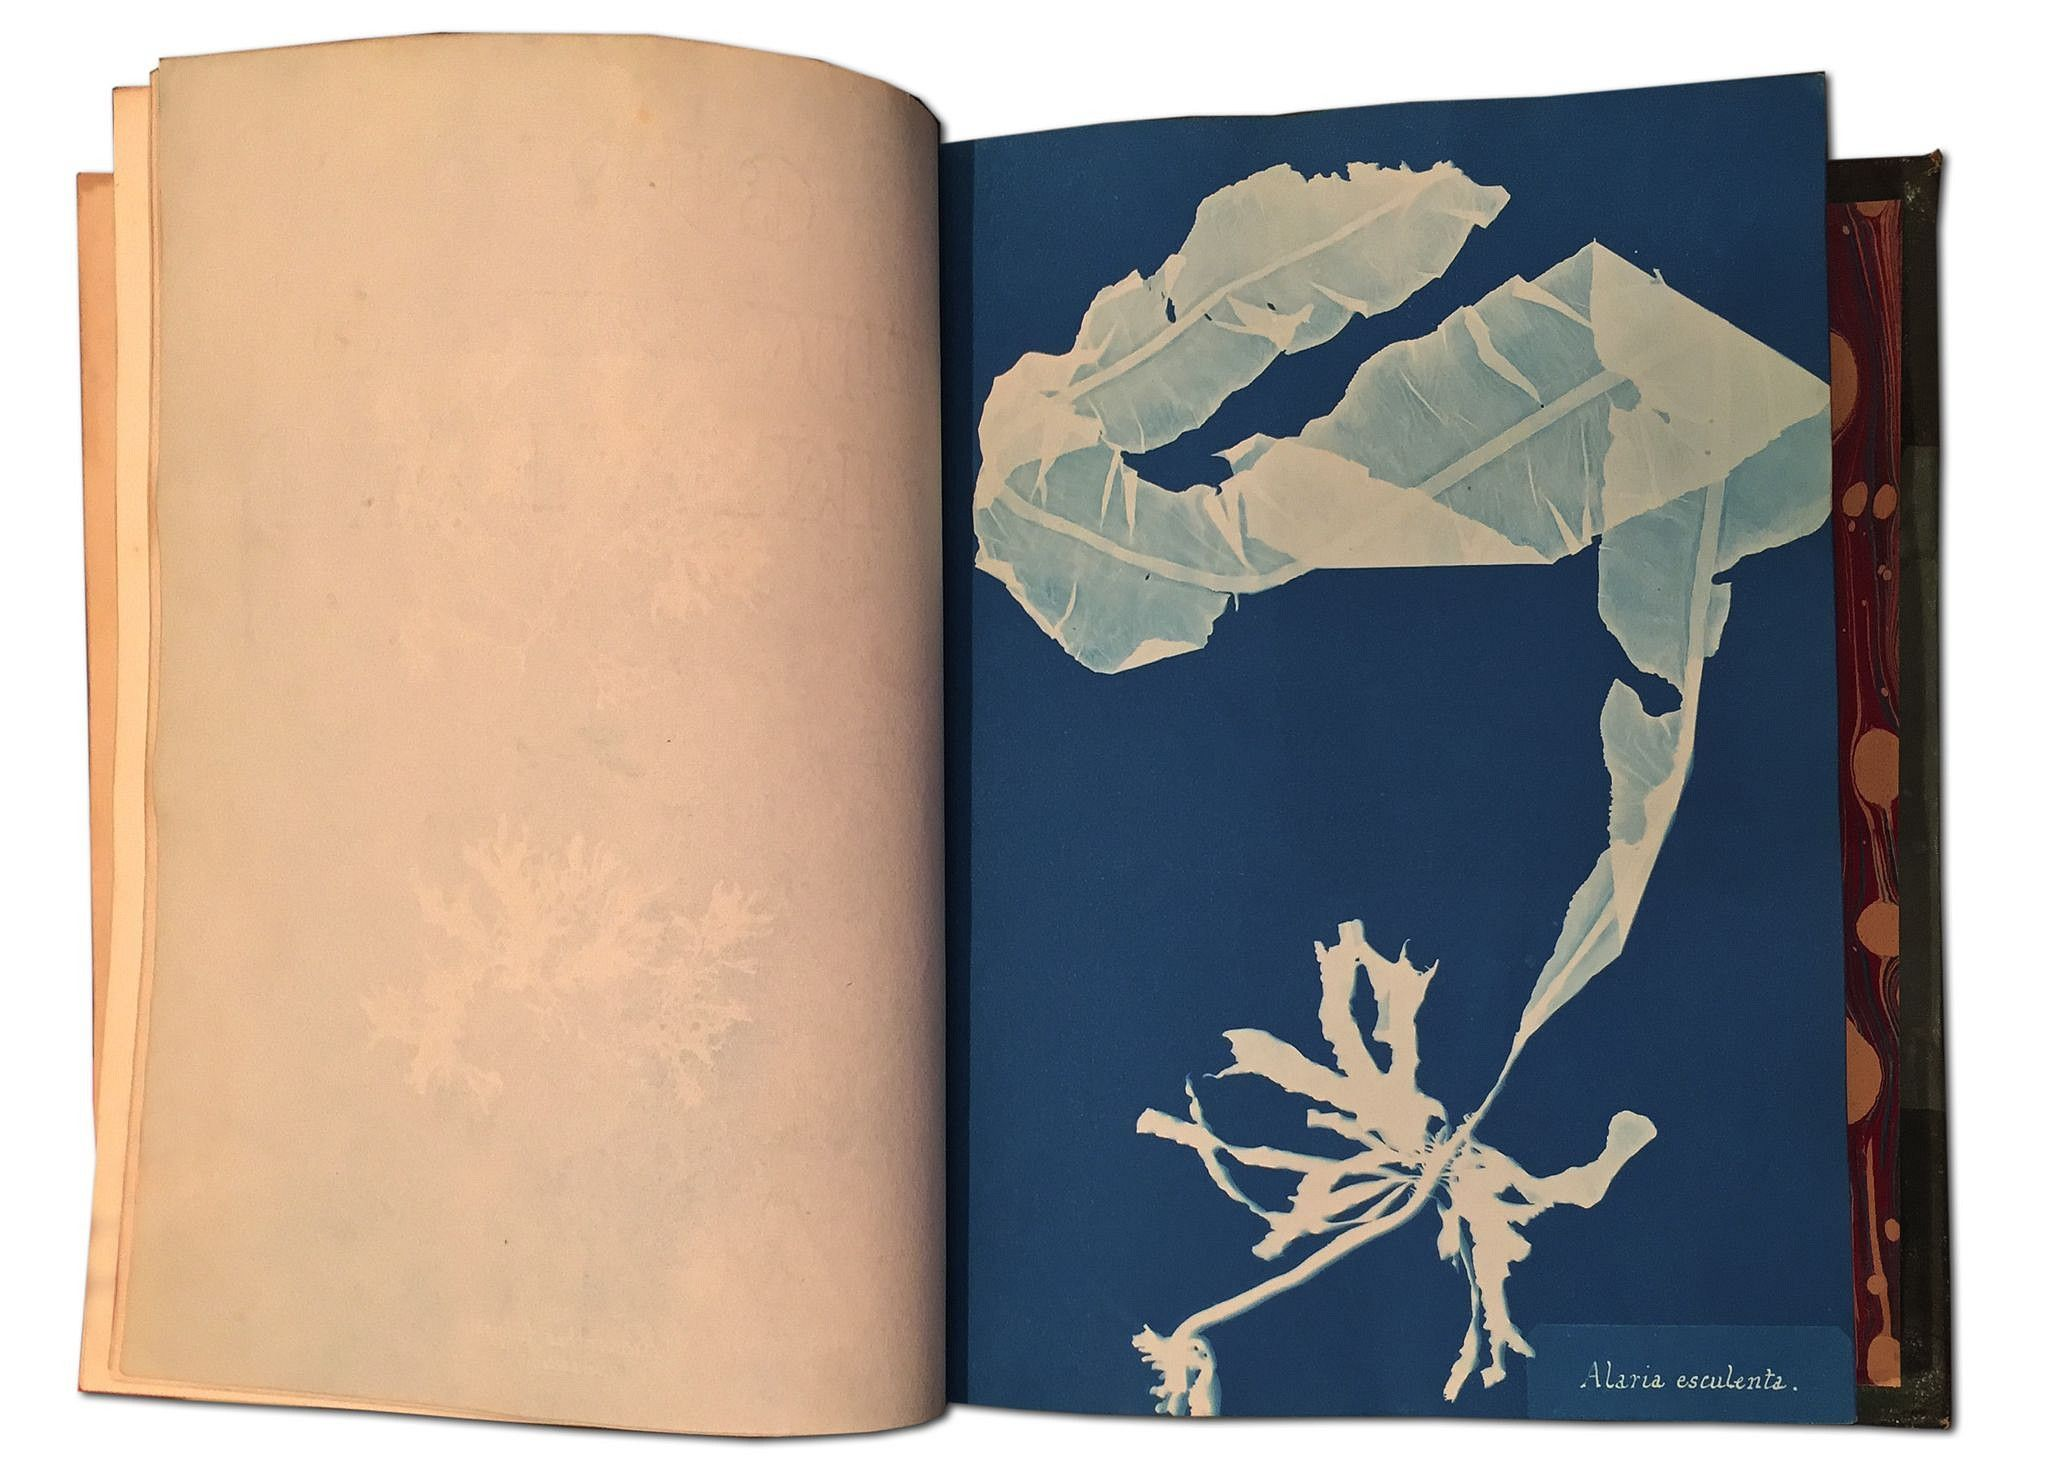 Anna Atkins, Photographs of British Algae: Cyanotype Impressions 1843